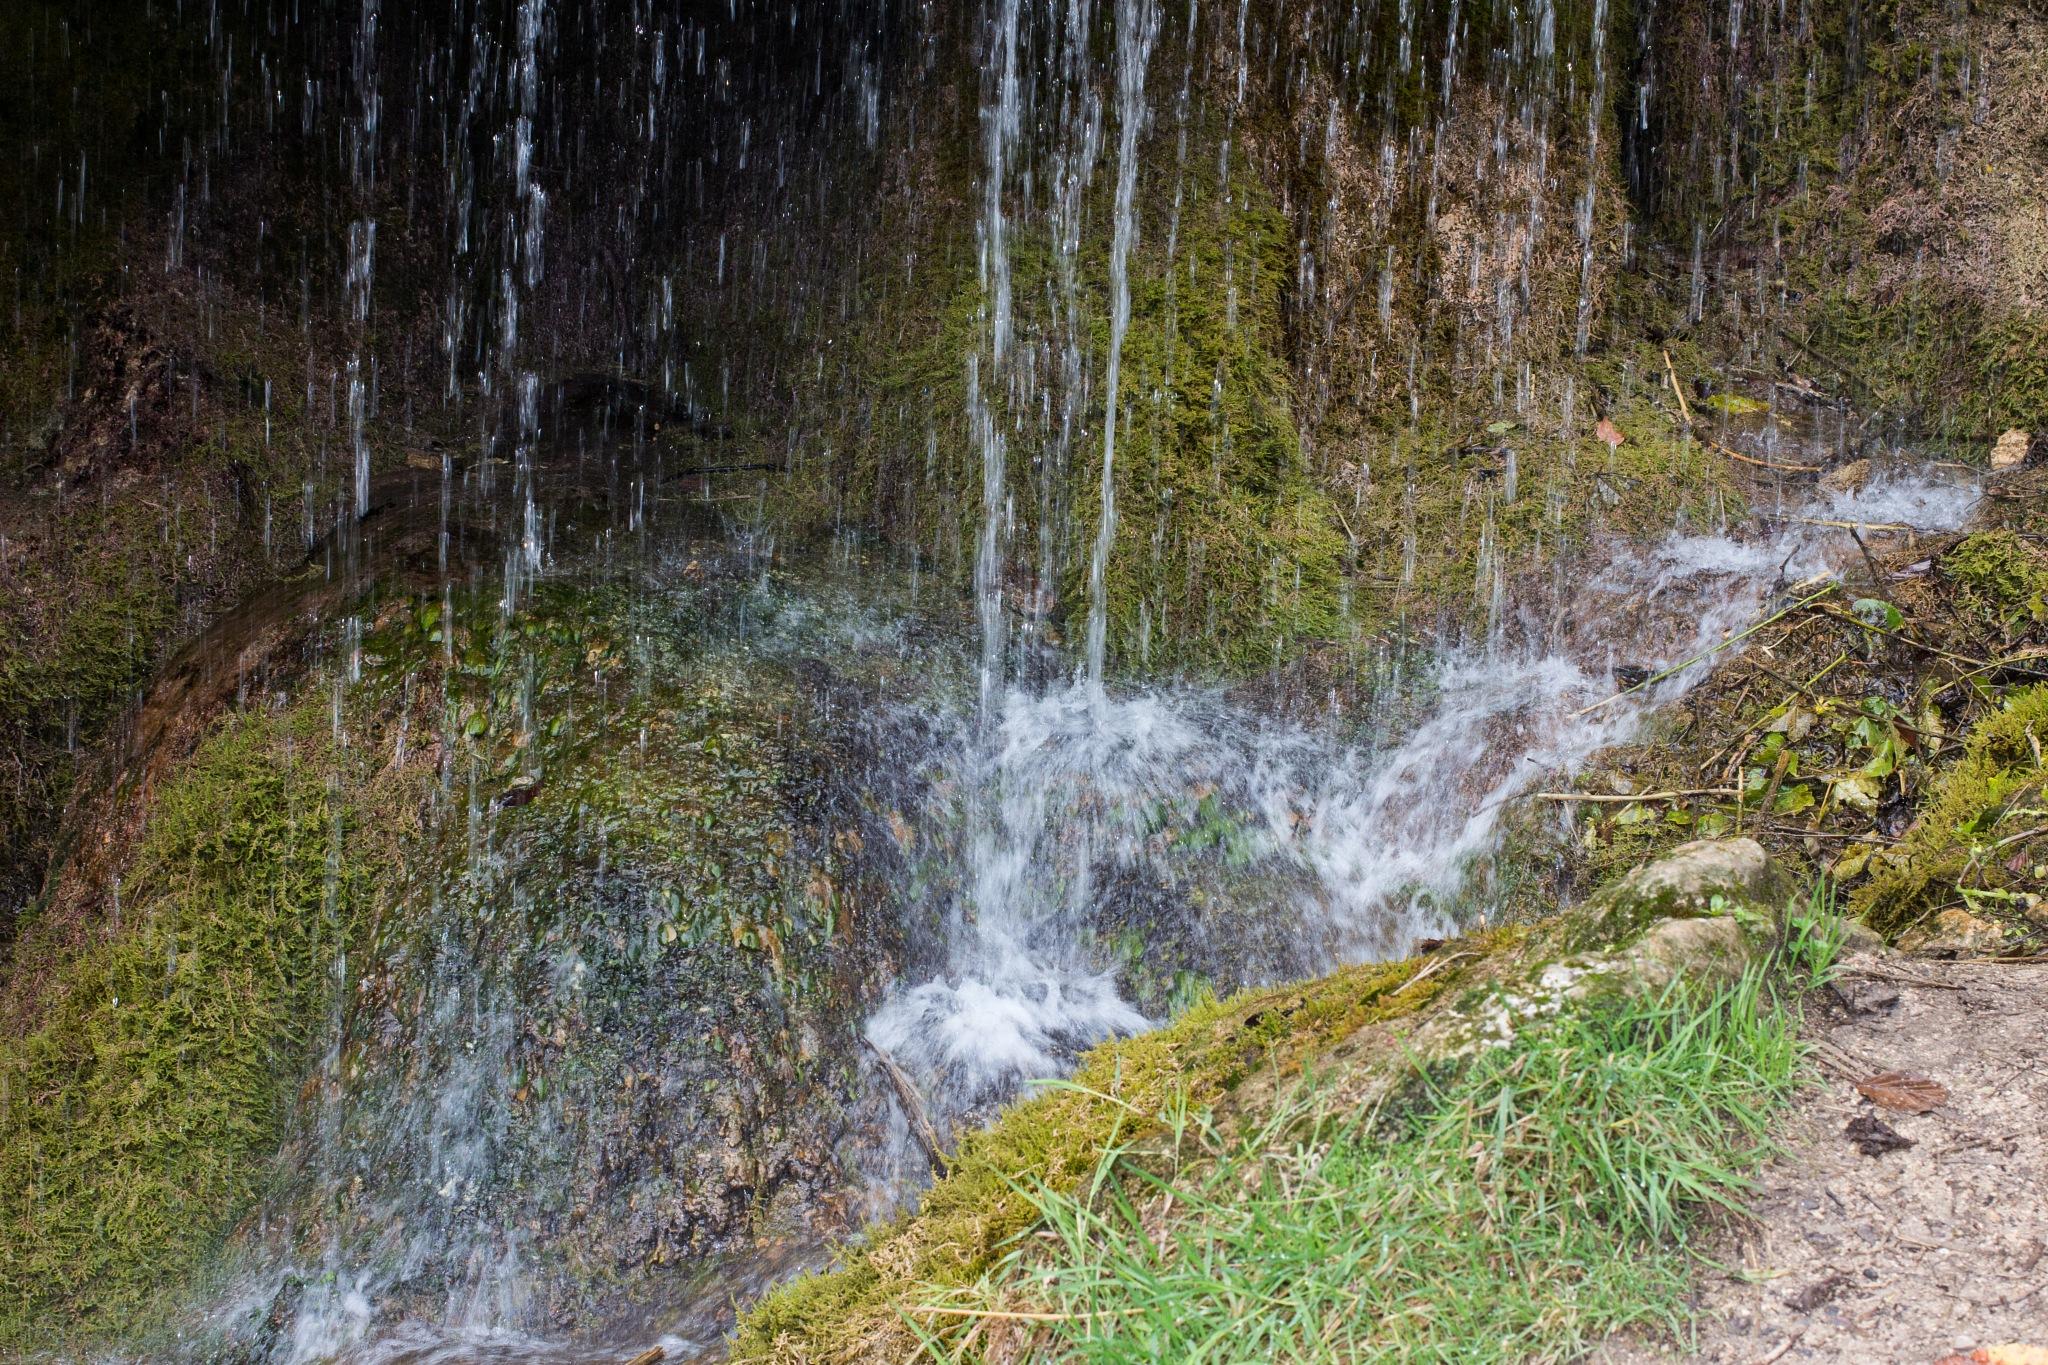 Wasserfall by fritshendriksfotografie